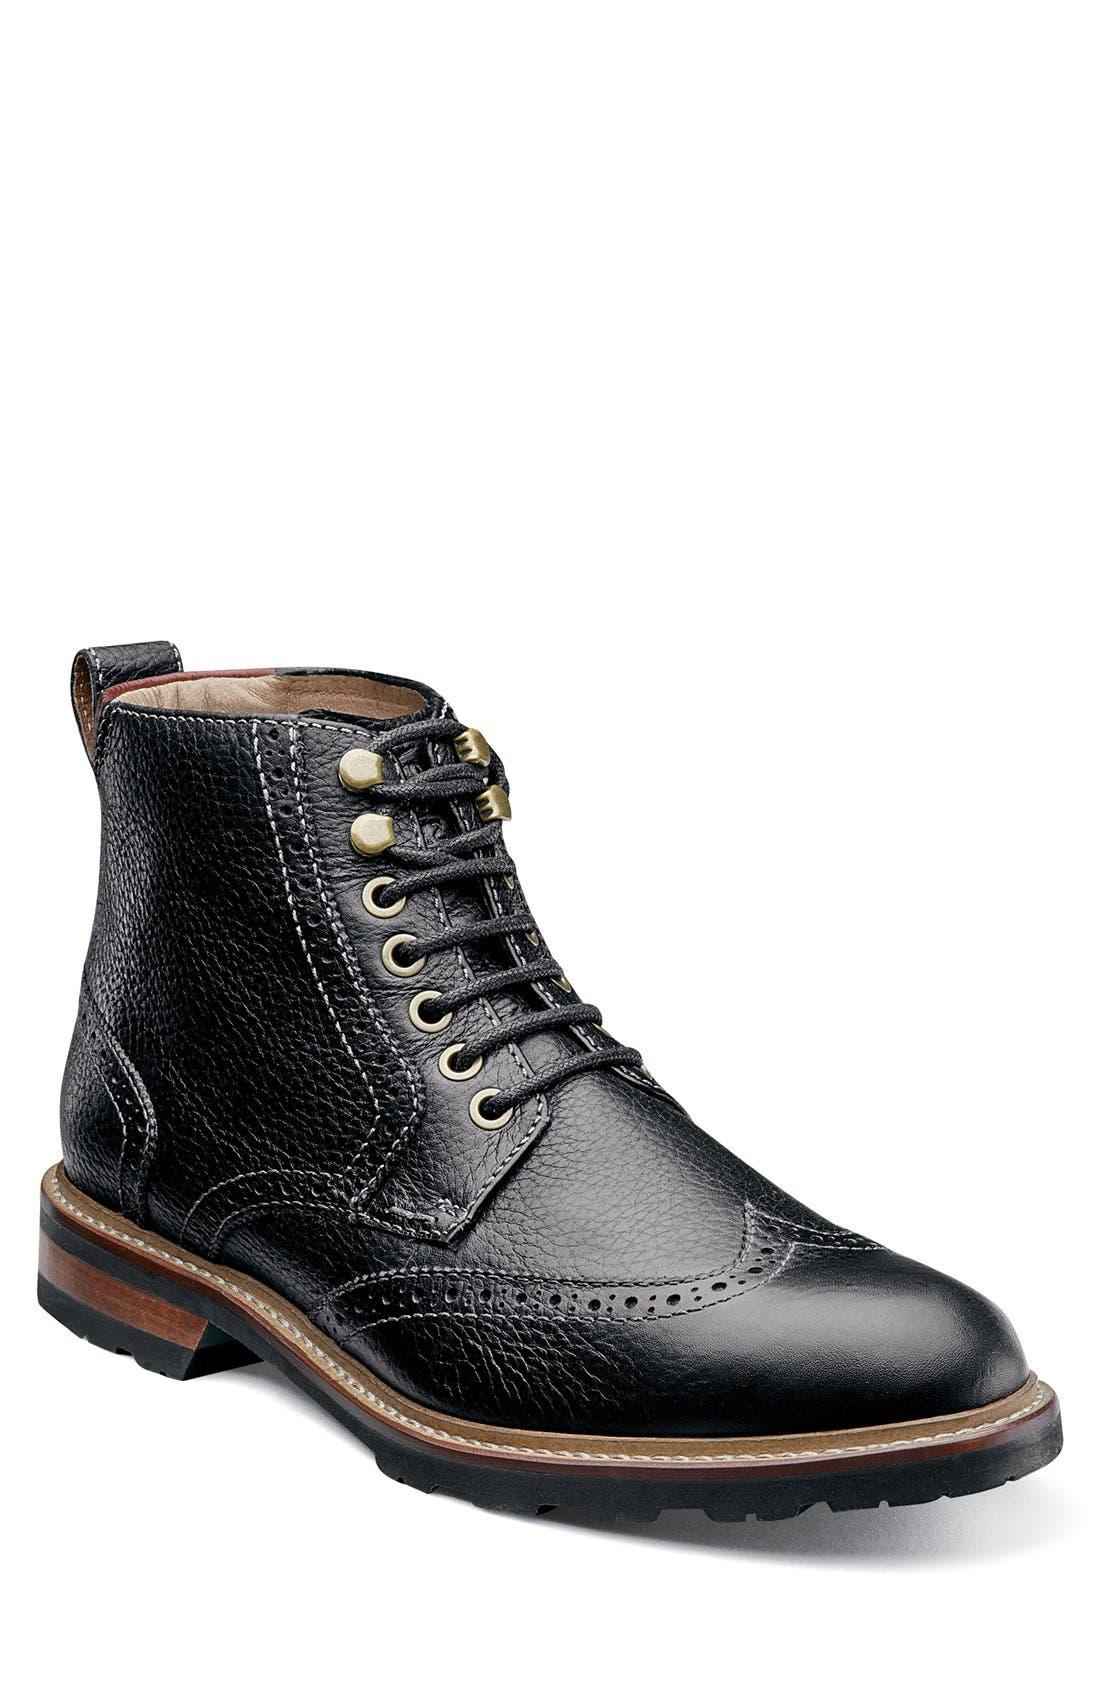 FLORSHEIM 'Kilbourn' Wingtip Boot, Main, color, 001